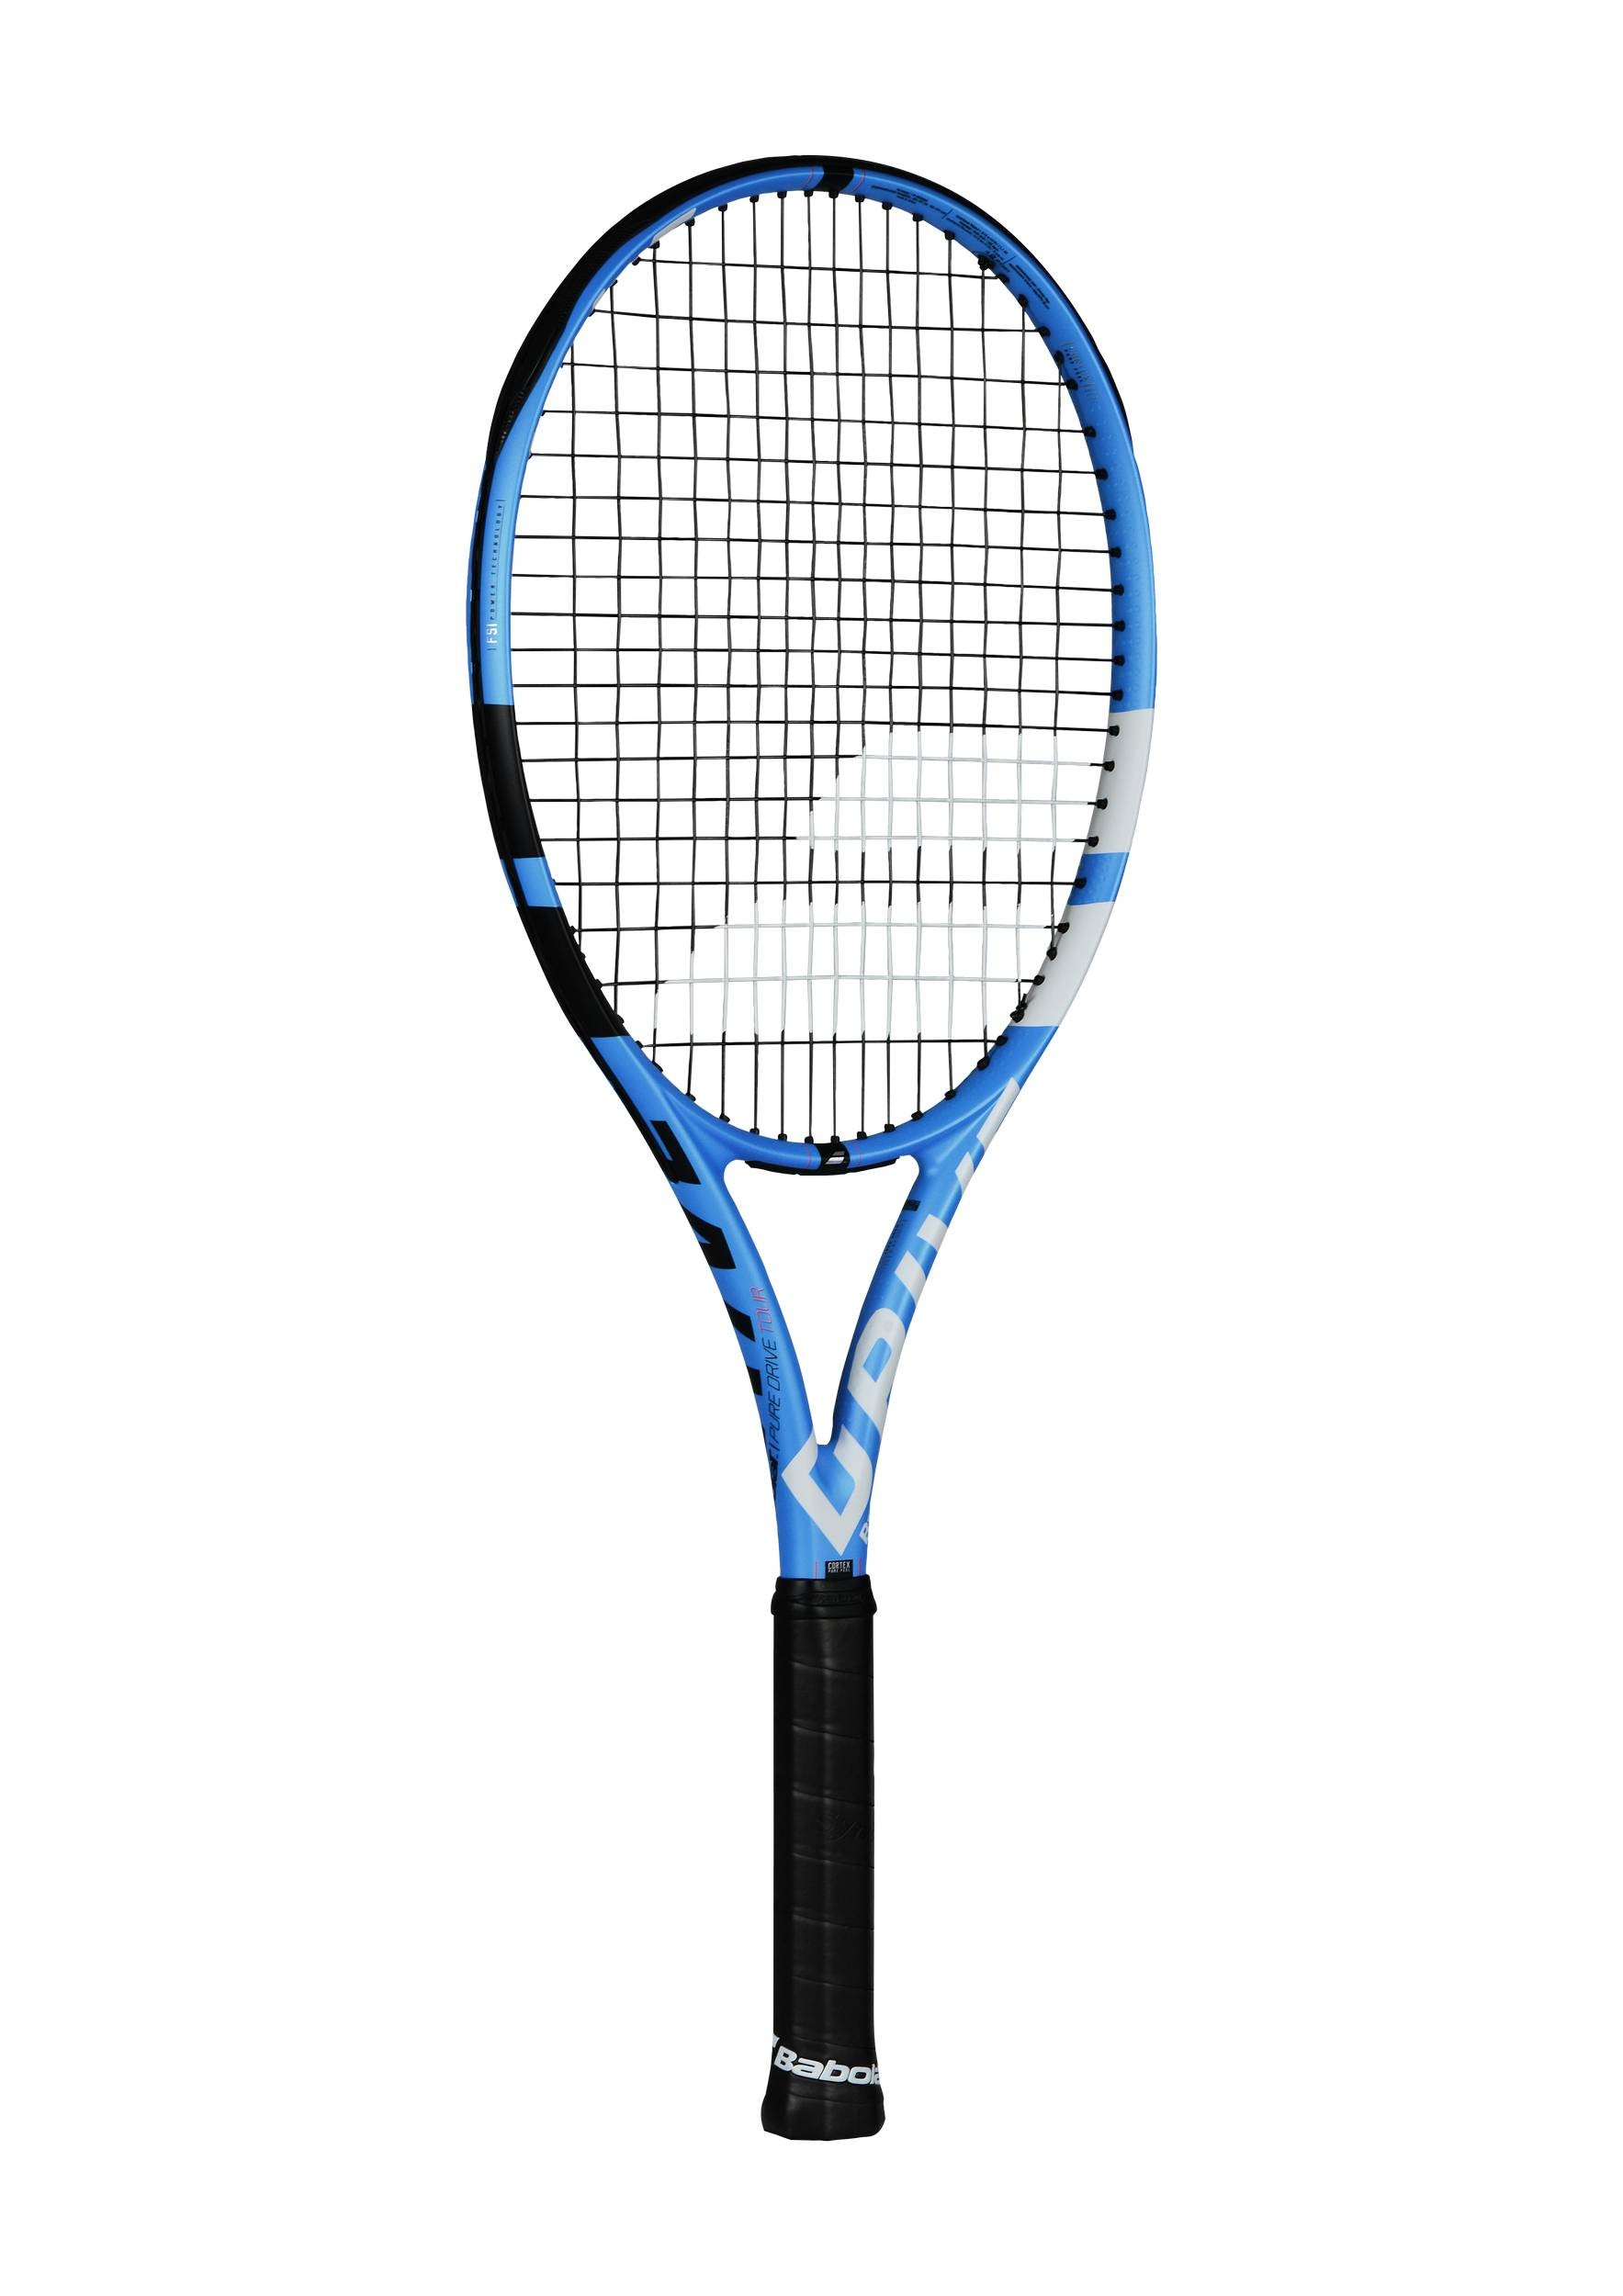 Rakieta tenisowa Babolat Pure Drive Tour+ 2018 + RPM Blast + VS Grip